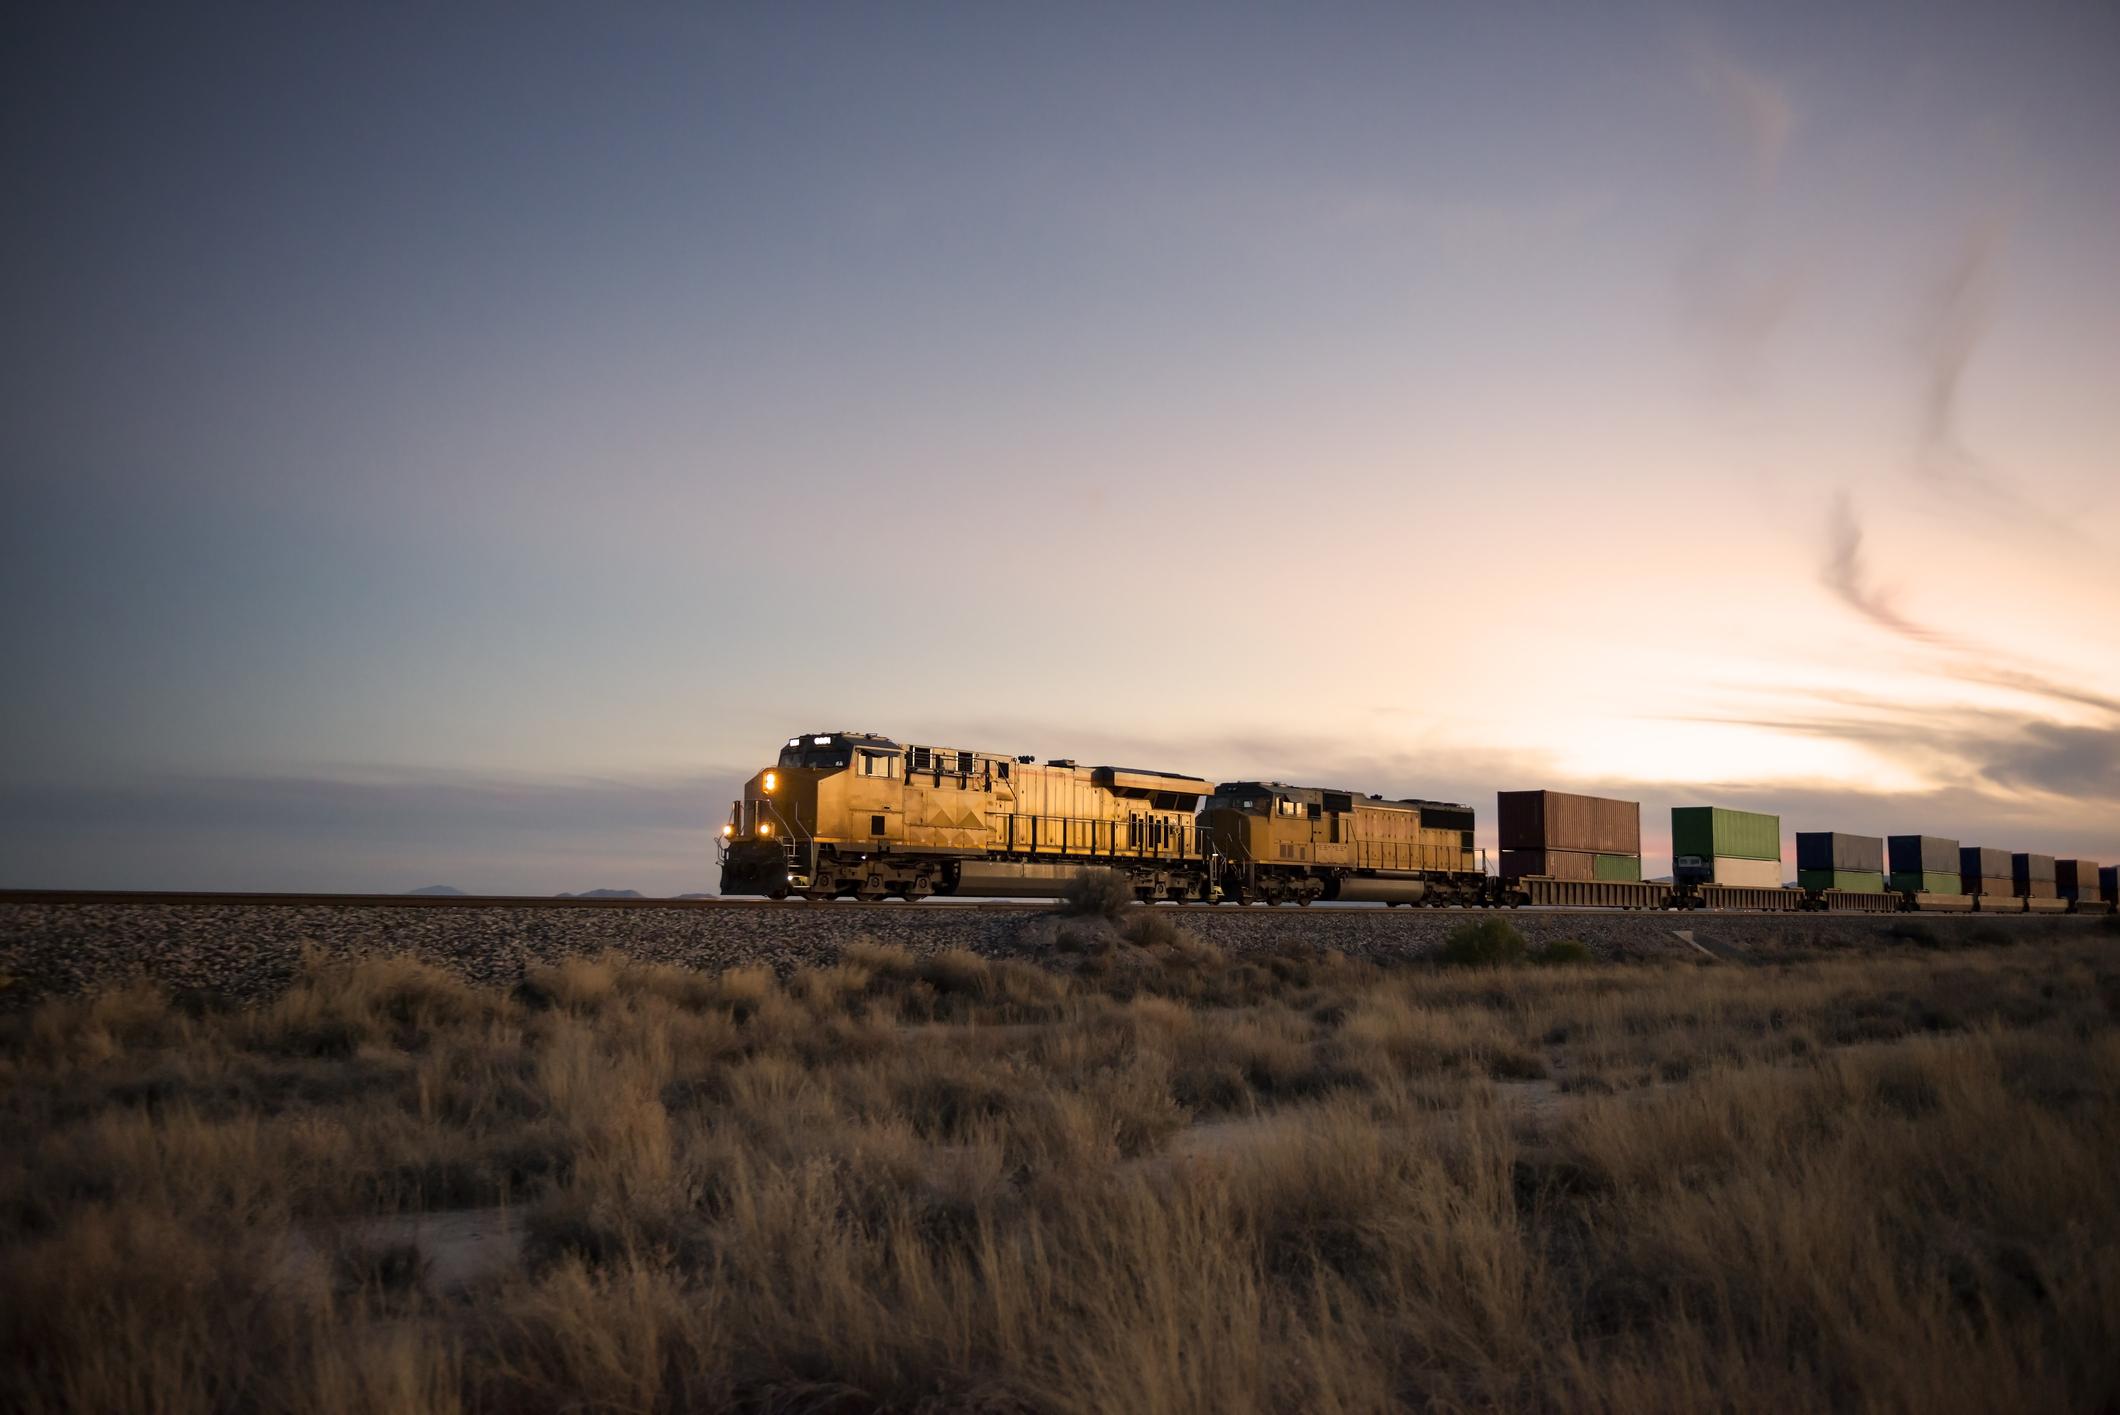 Railroad locomotive at dusk.